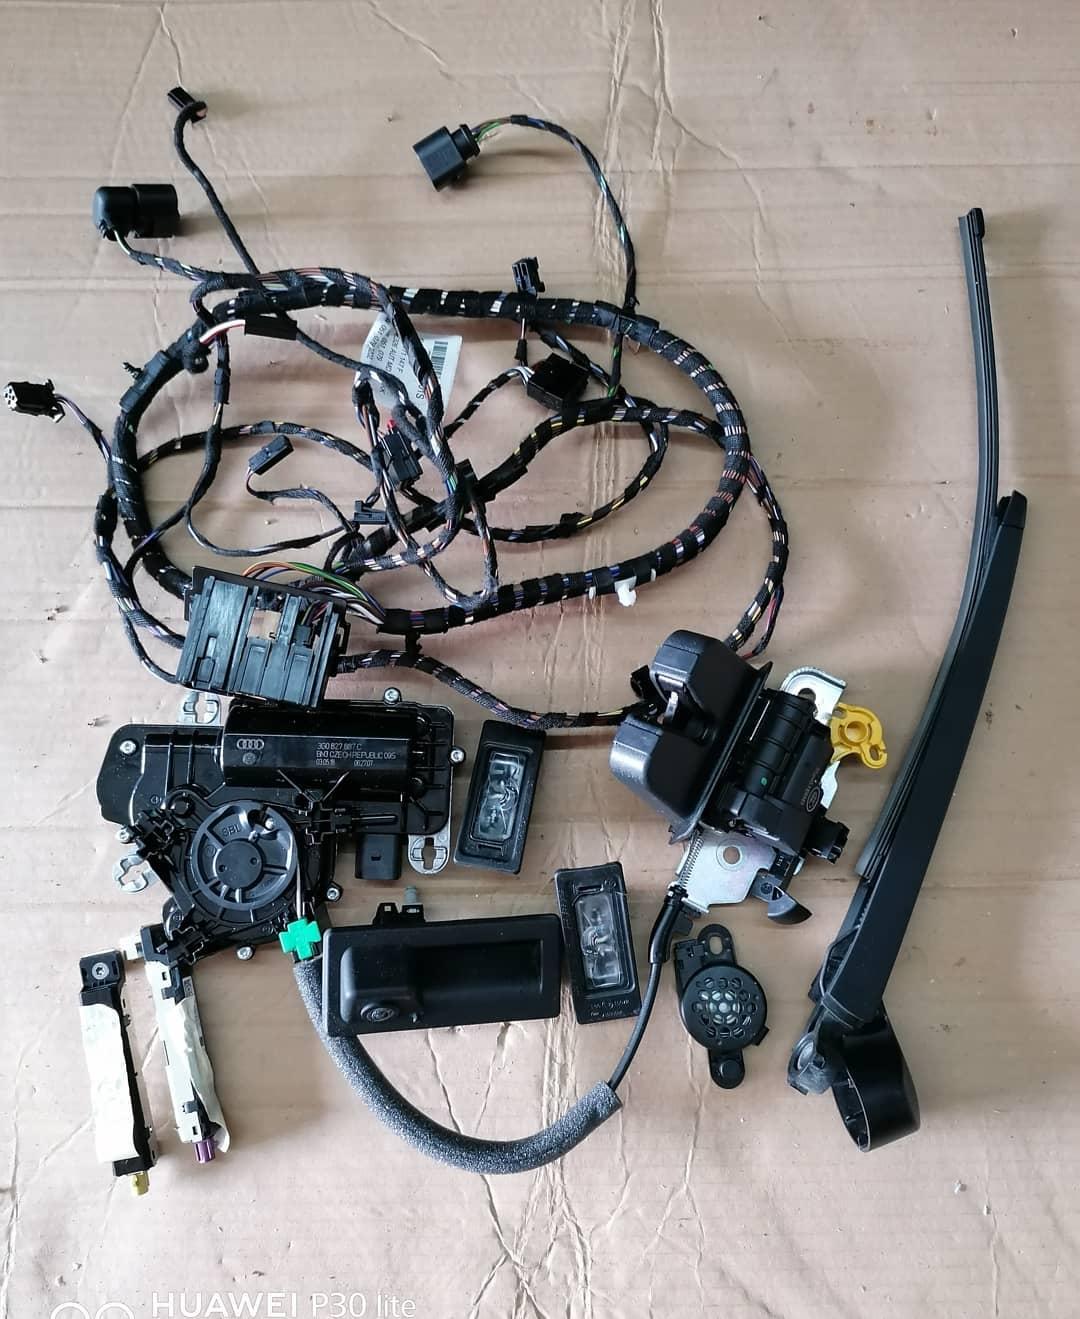 Seat Tarraco 2019 Mecanism hayon Camera marsalier, instalatie, braosca cu motoras, buzzer parcare, iluminare numar, amplificator antena si stergator.!!